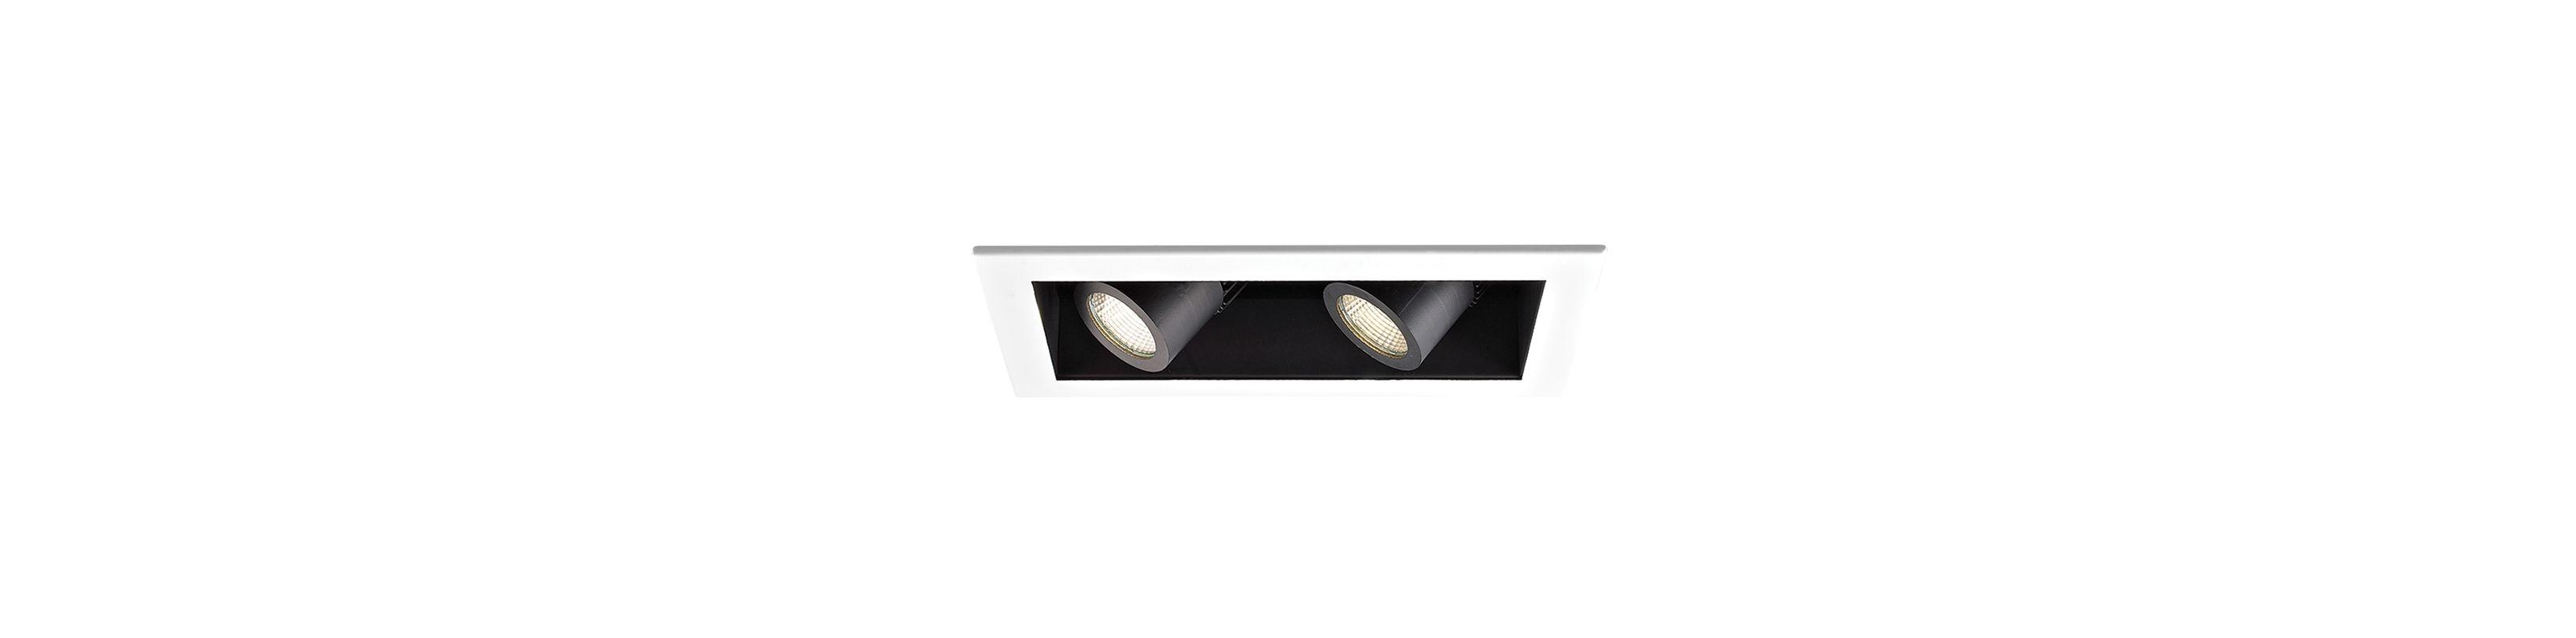 WAC Lighting MT-4LD216N-F30 2 Light Energy Star 3000K High Output LED Sale $468.00 ITEM#: 2426799 MODEL# :MT-4LD216N-F30-BK UPC#: 790576278032 :